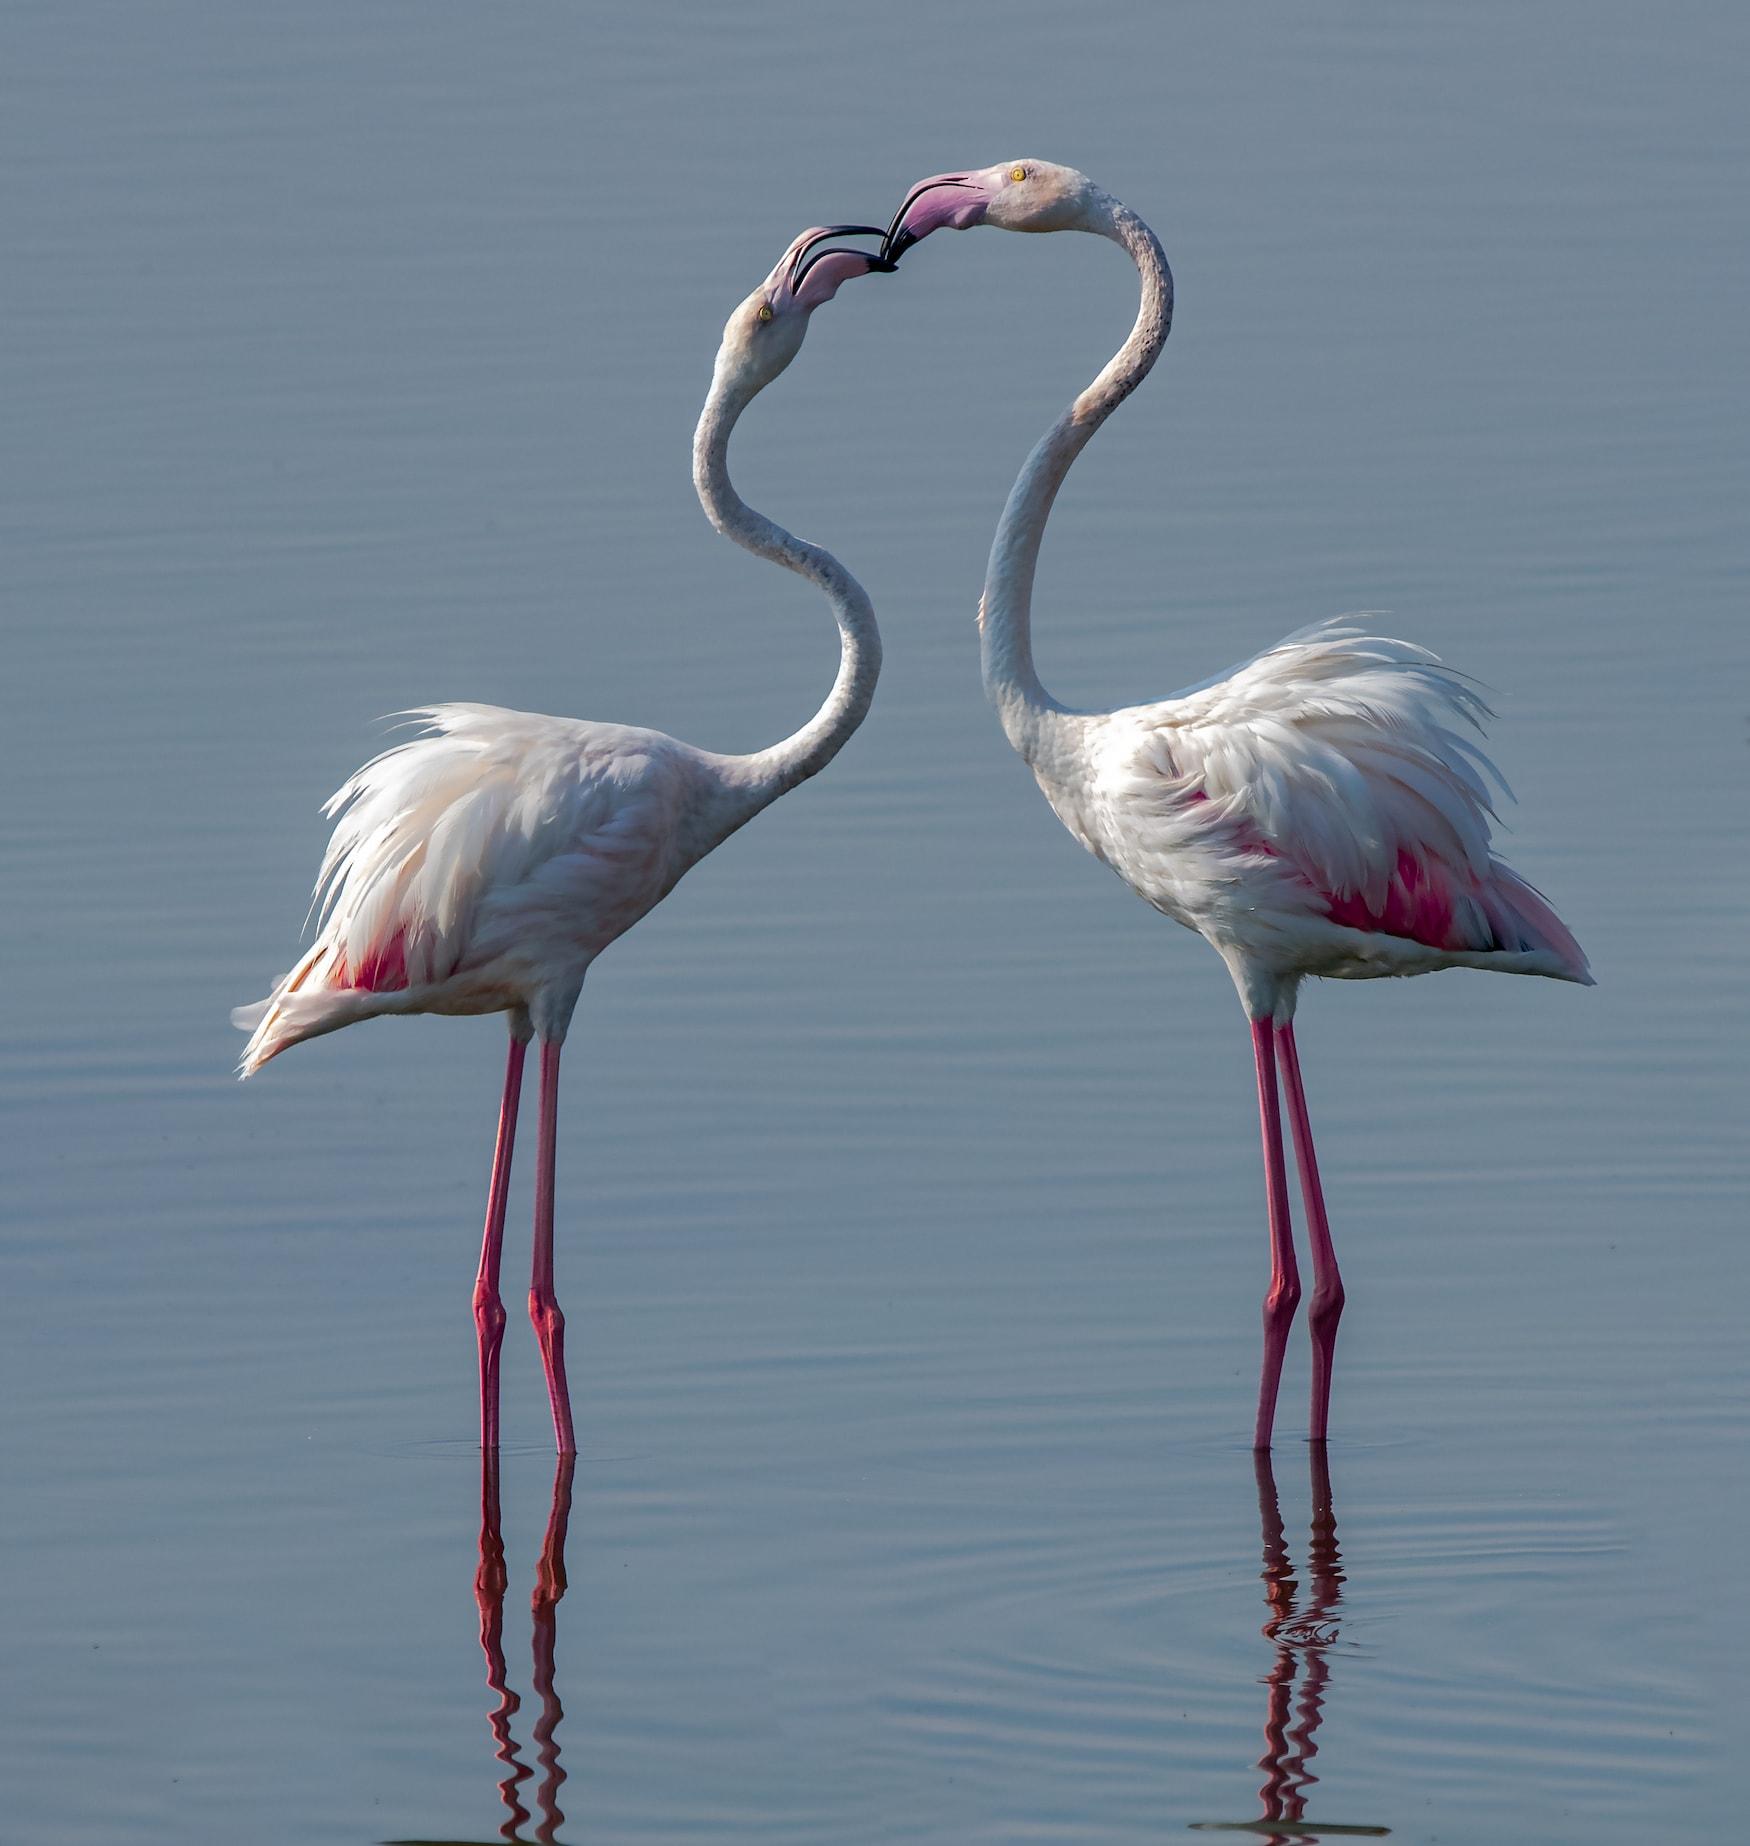 Zwei Flamingos in Katar